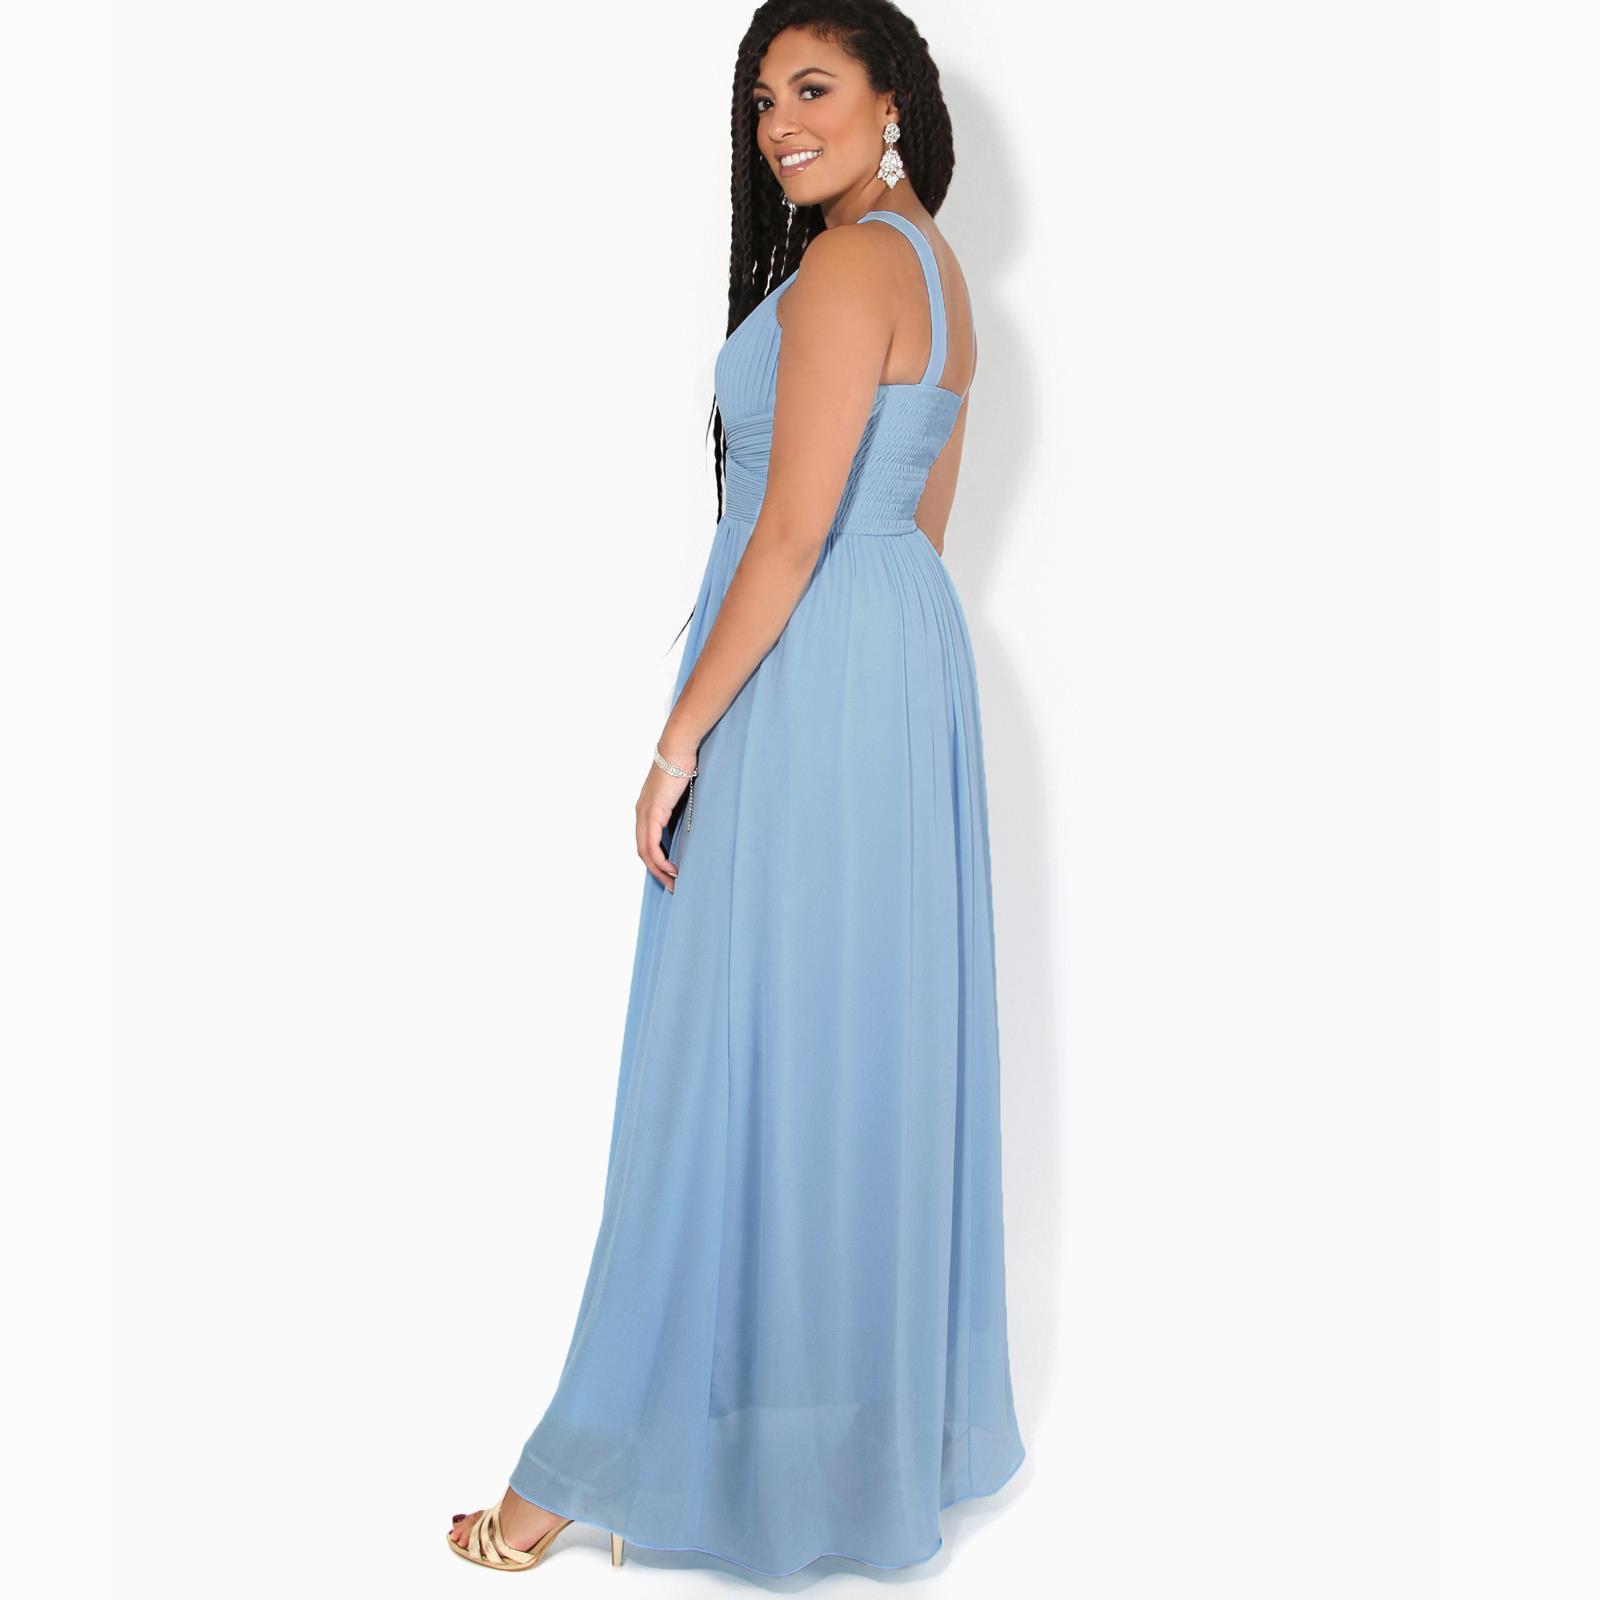 Women-Ladies-Long-Cocktail-Wedding-Bridesmaid-Evening-Maxi-Dress-Formal-Gown thumbnail 4